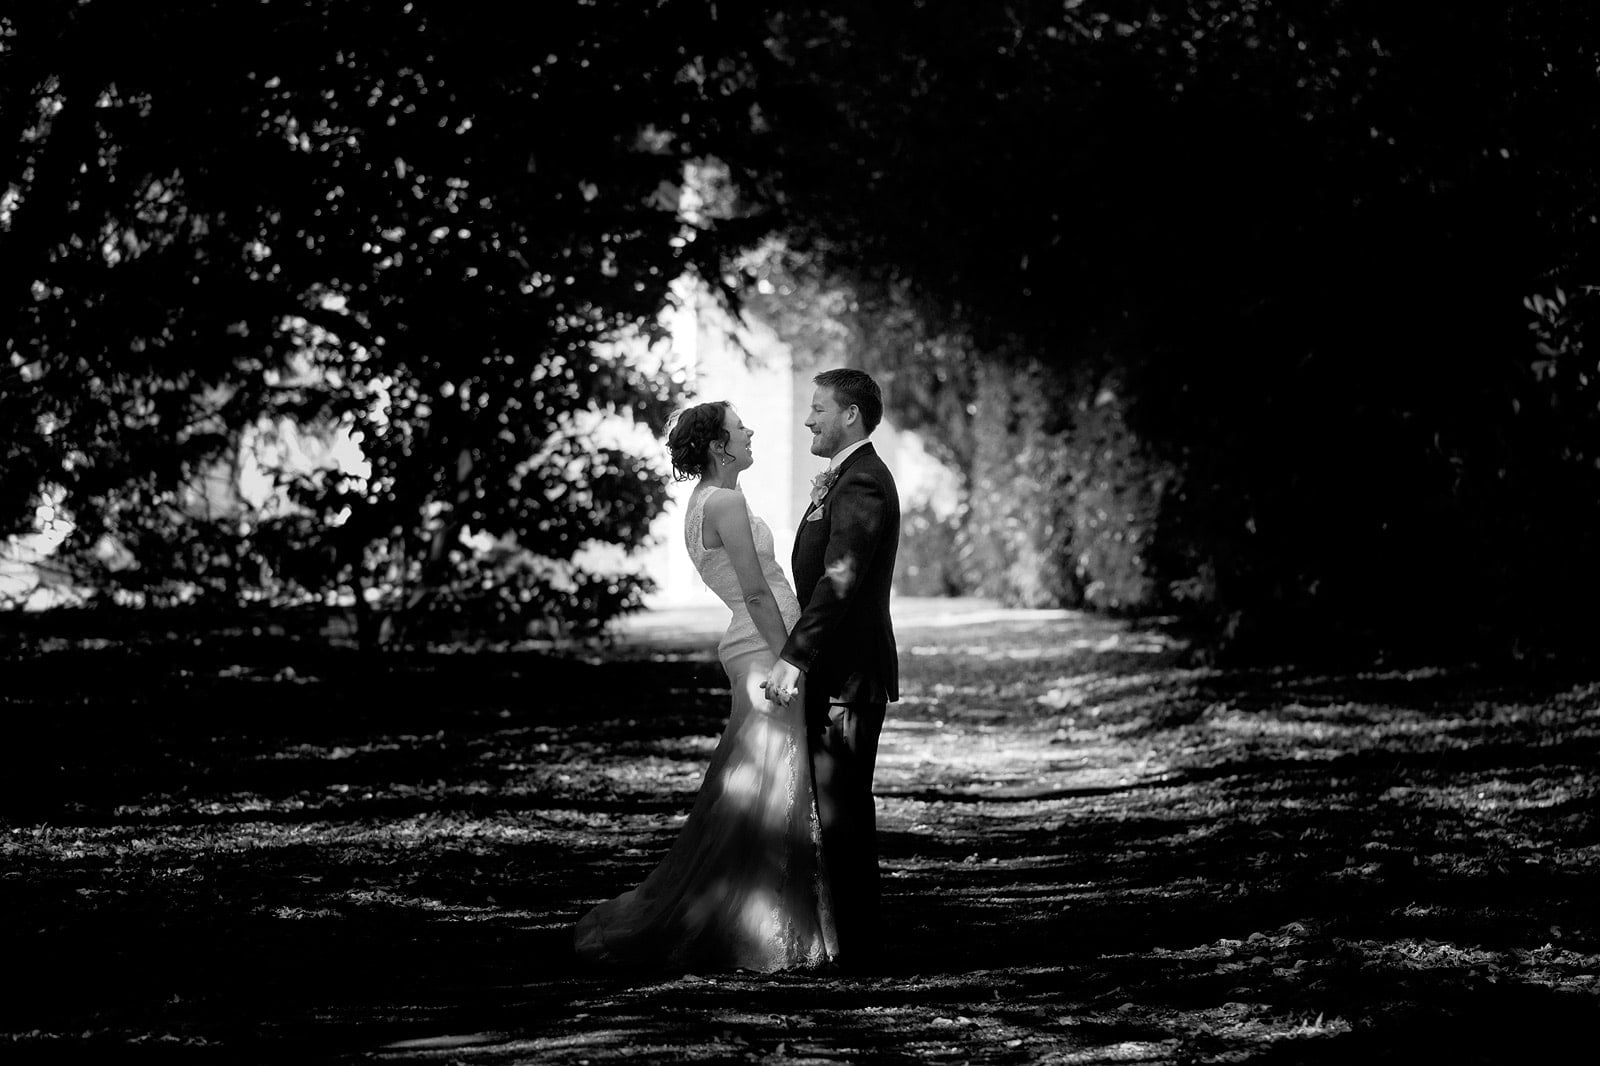 Smeetham Hall Barn wedding photographer | Just One